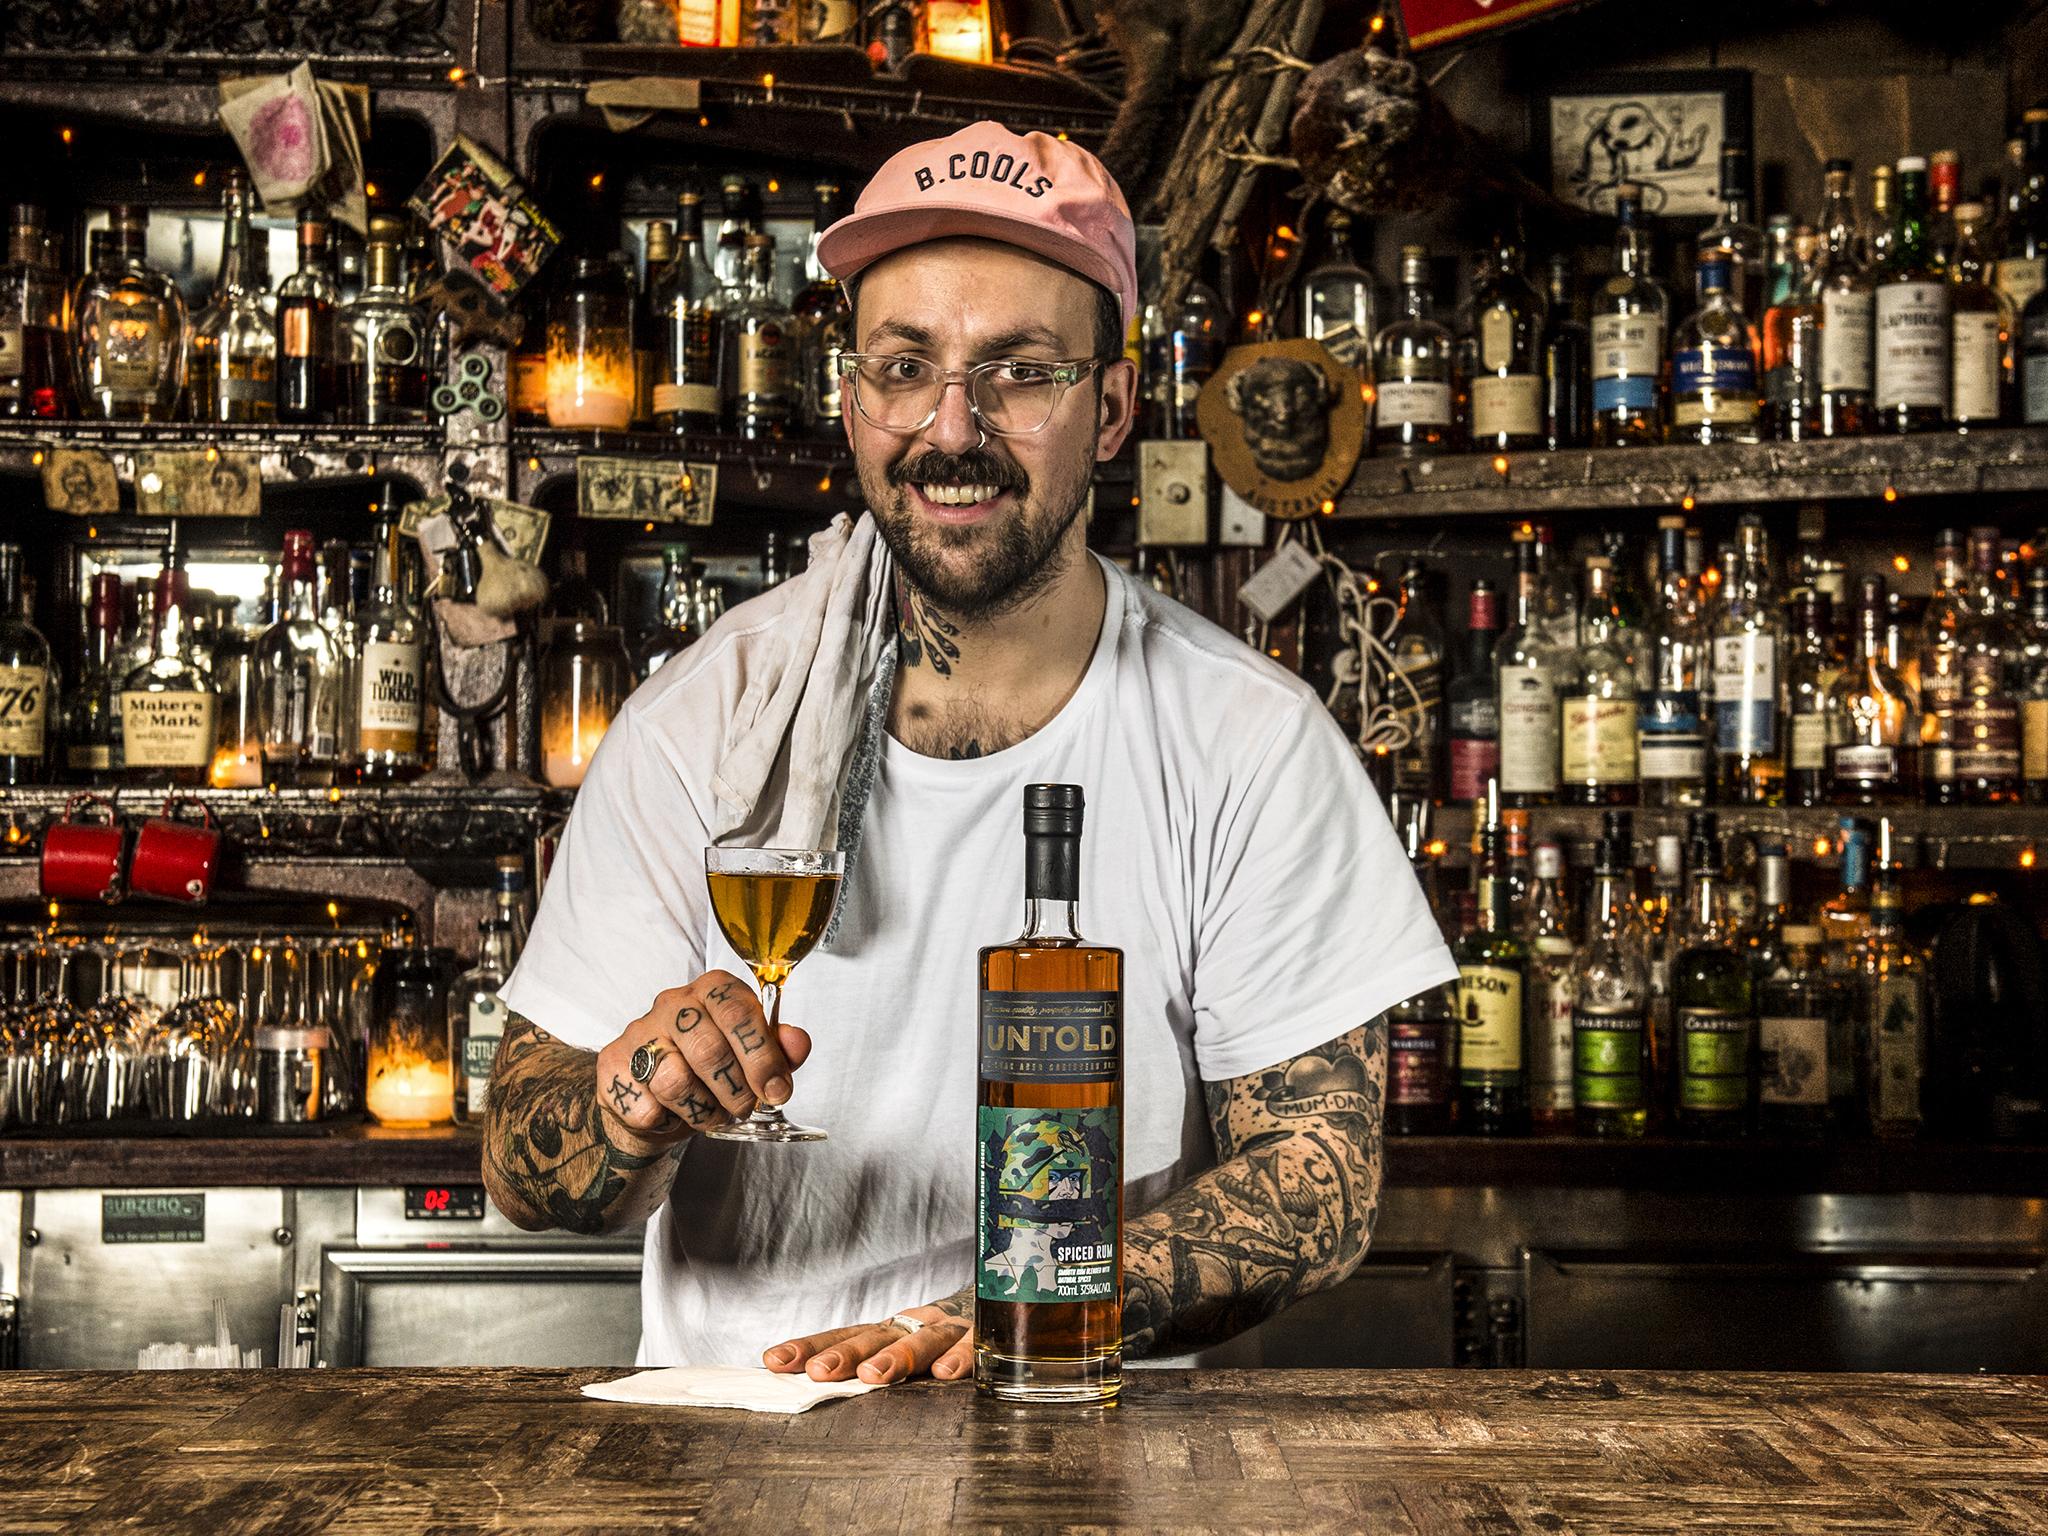 Commercial - Alen Nikolovski, Shady Pines Saloon